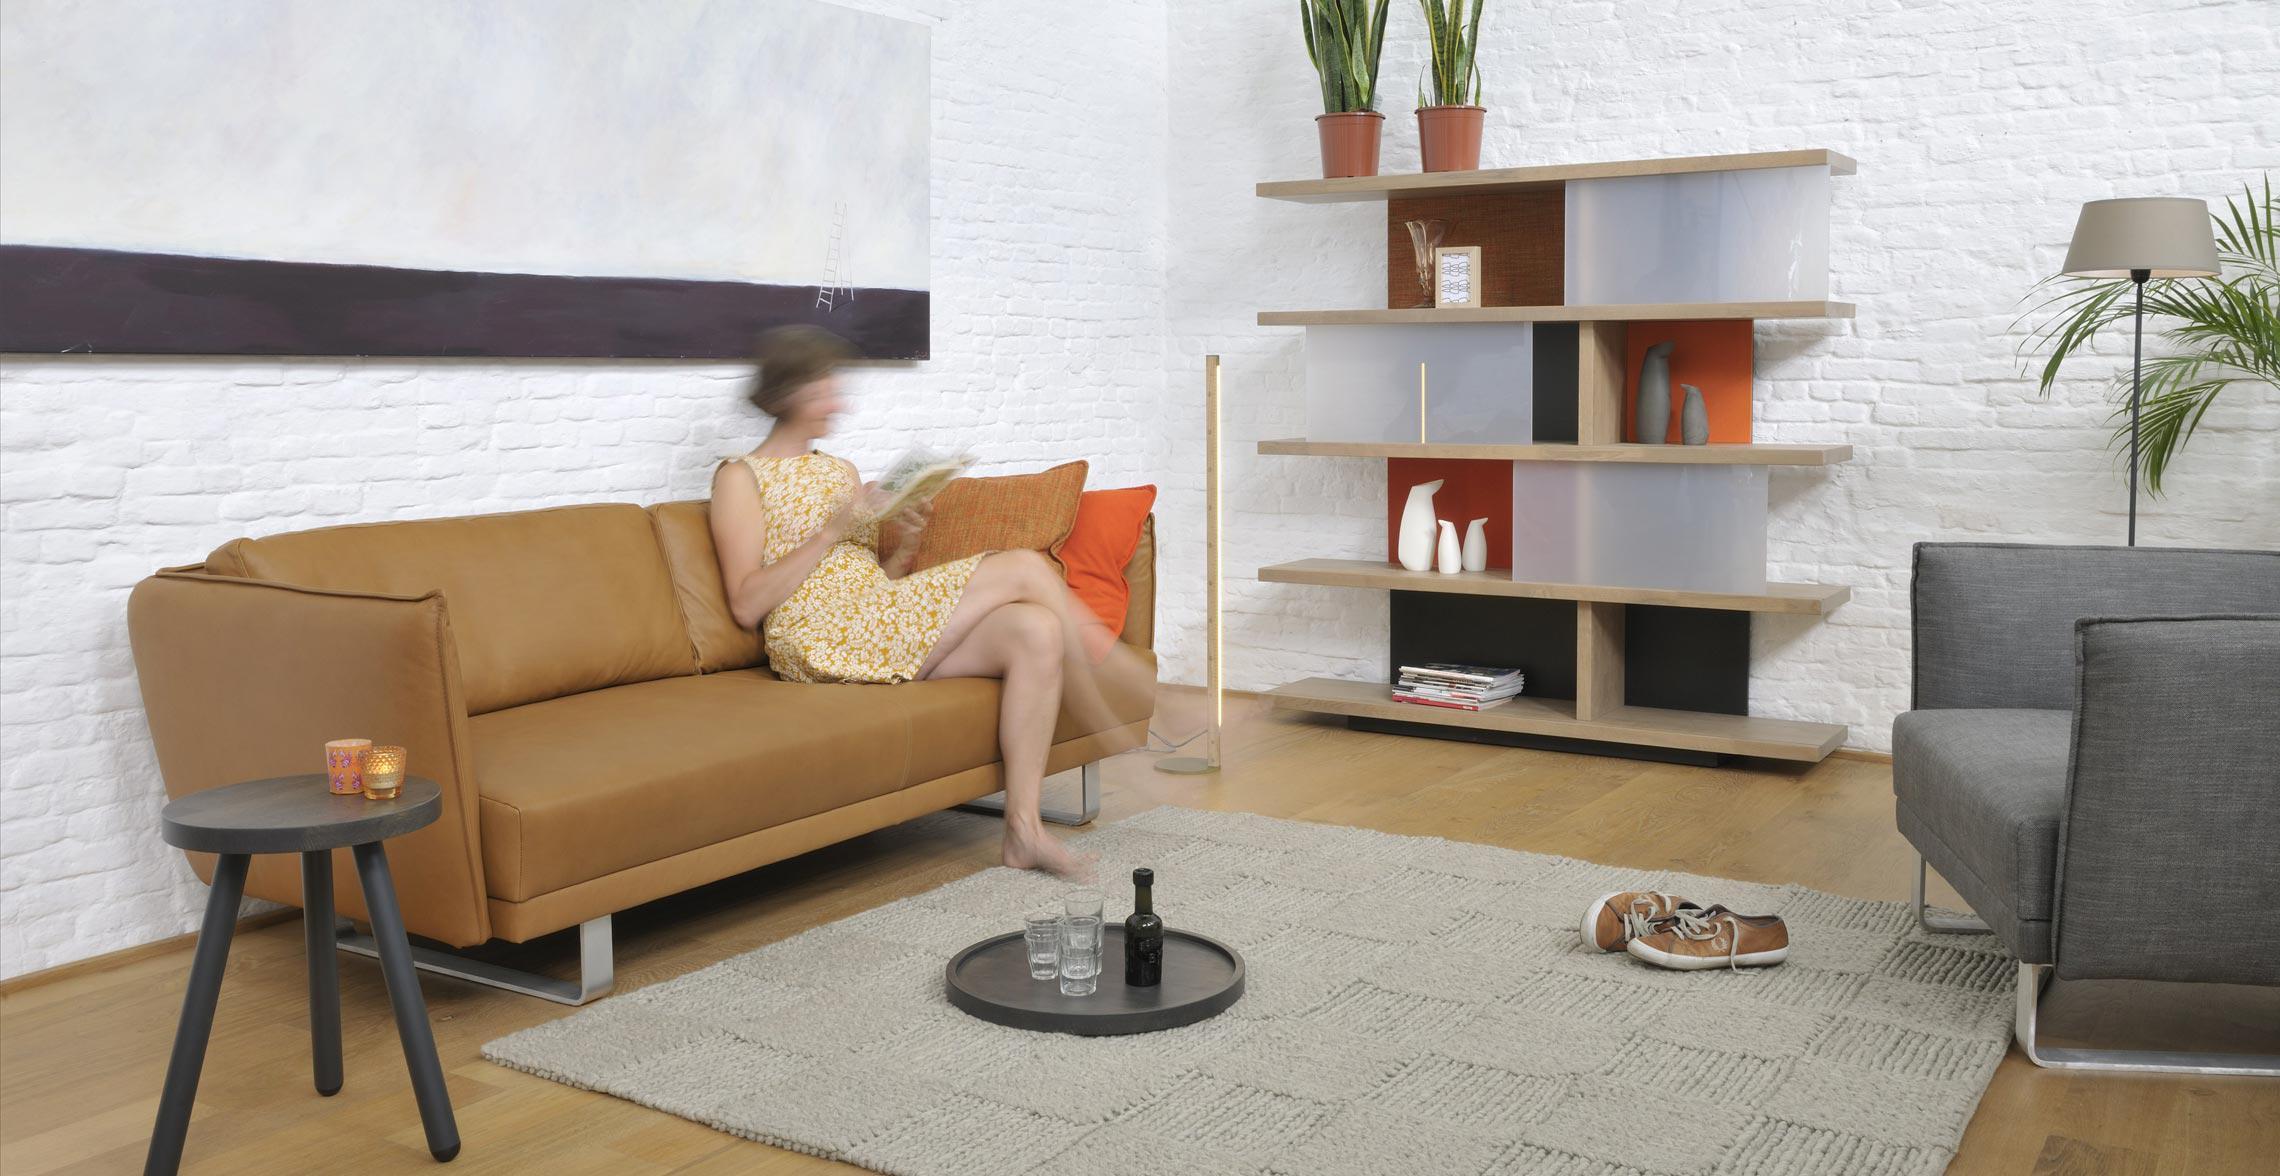 Design Meubels Aanbieding.Design Meubelen Interieur Plus Peer Design Eetkamers Salons